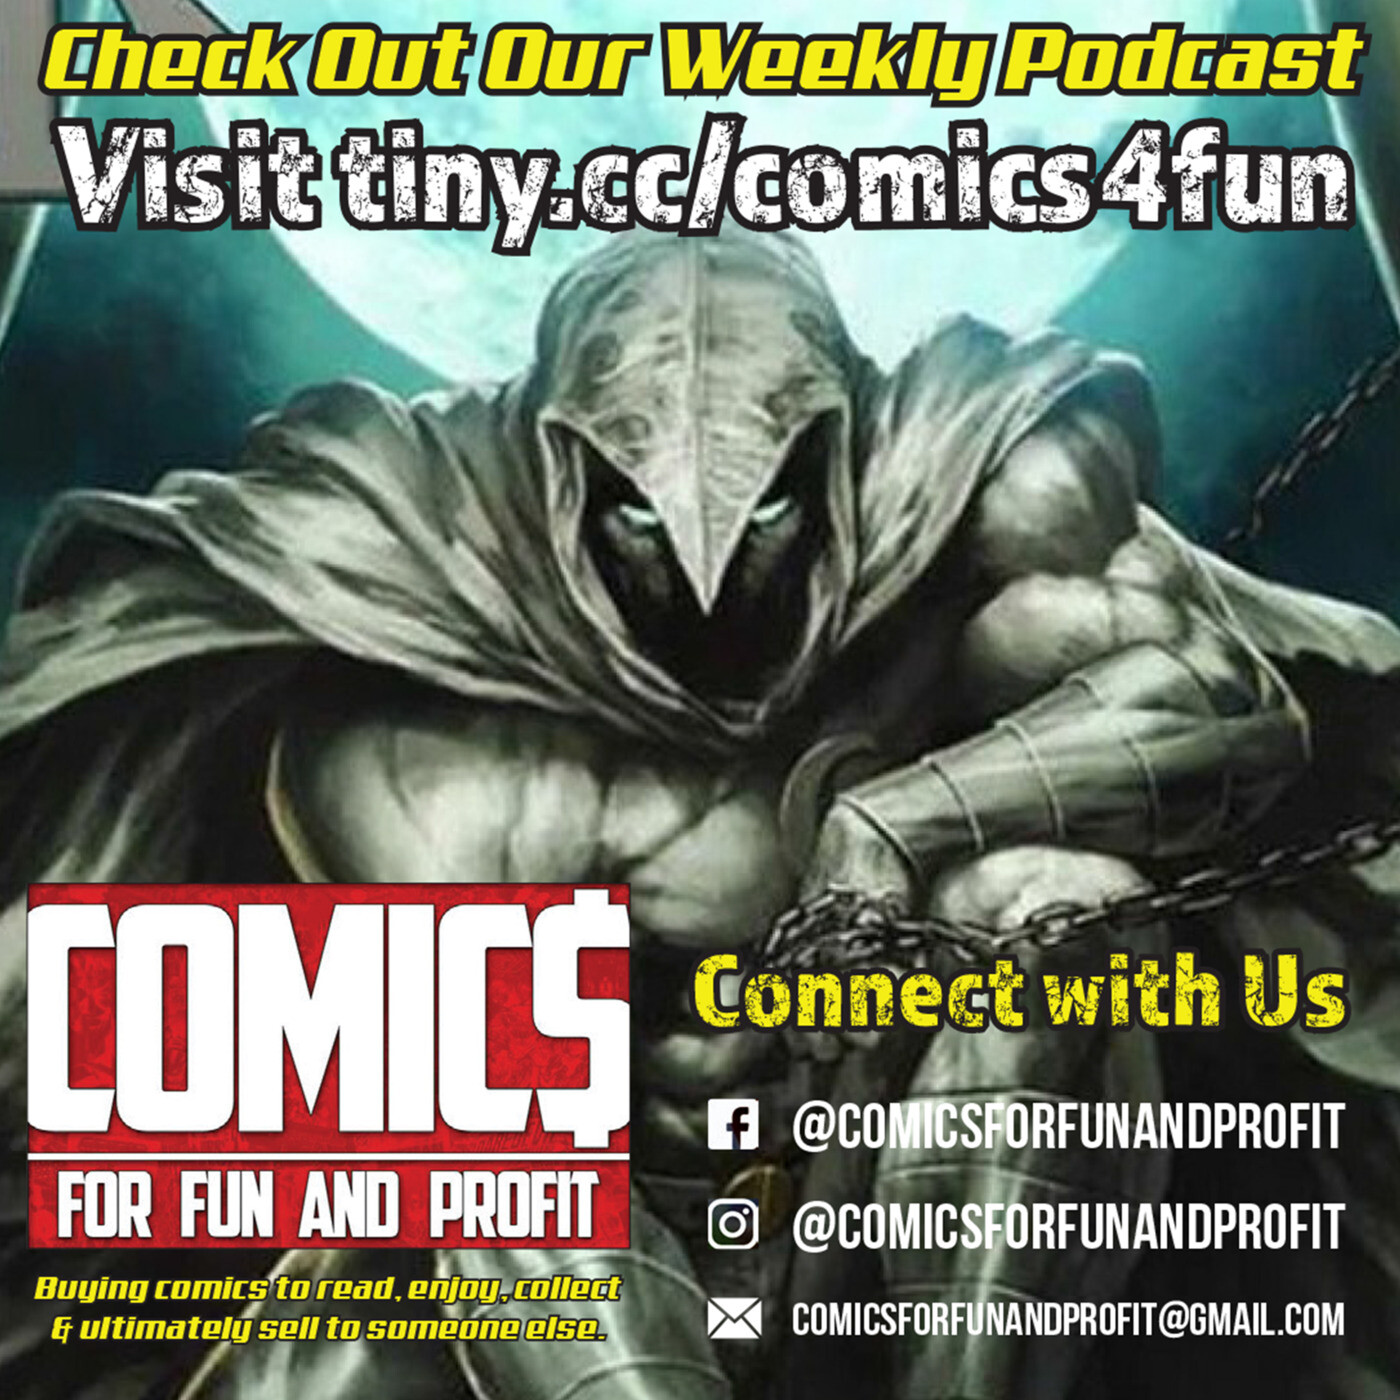 Episode 215-Batman #40 Drops a Bombshell, Alex & Ada #14 is Devastatingly Great, Convergence #4 is Still Happenin...